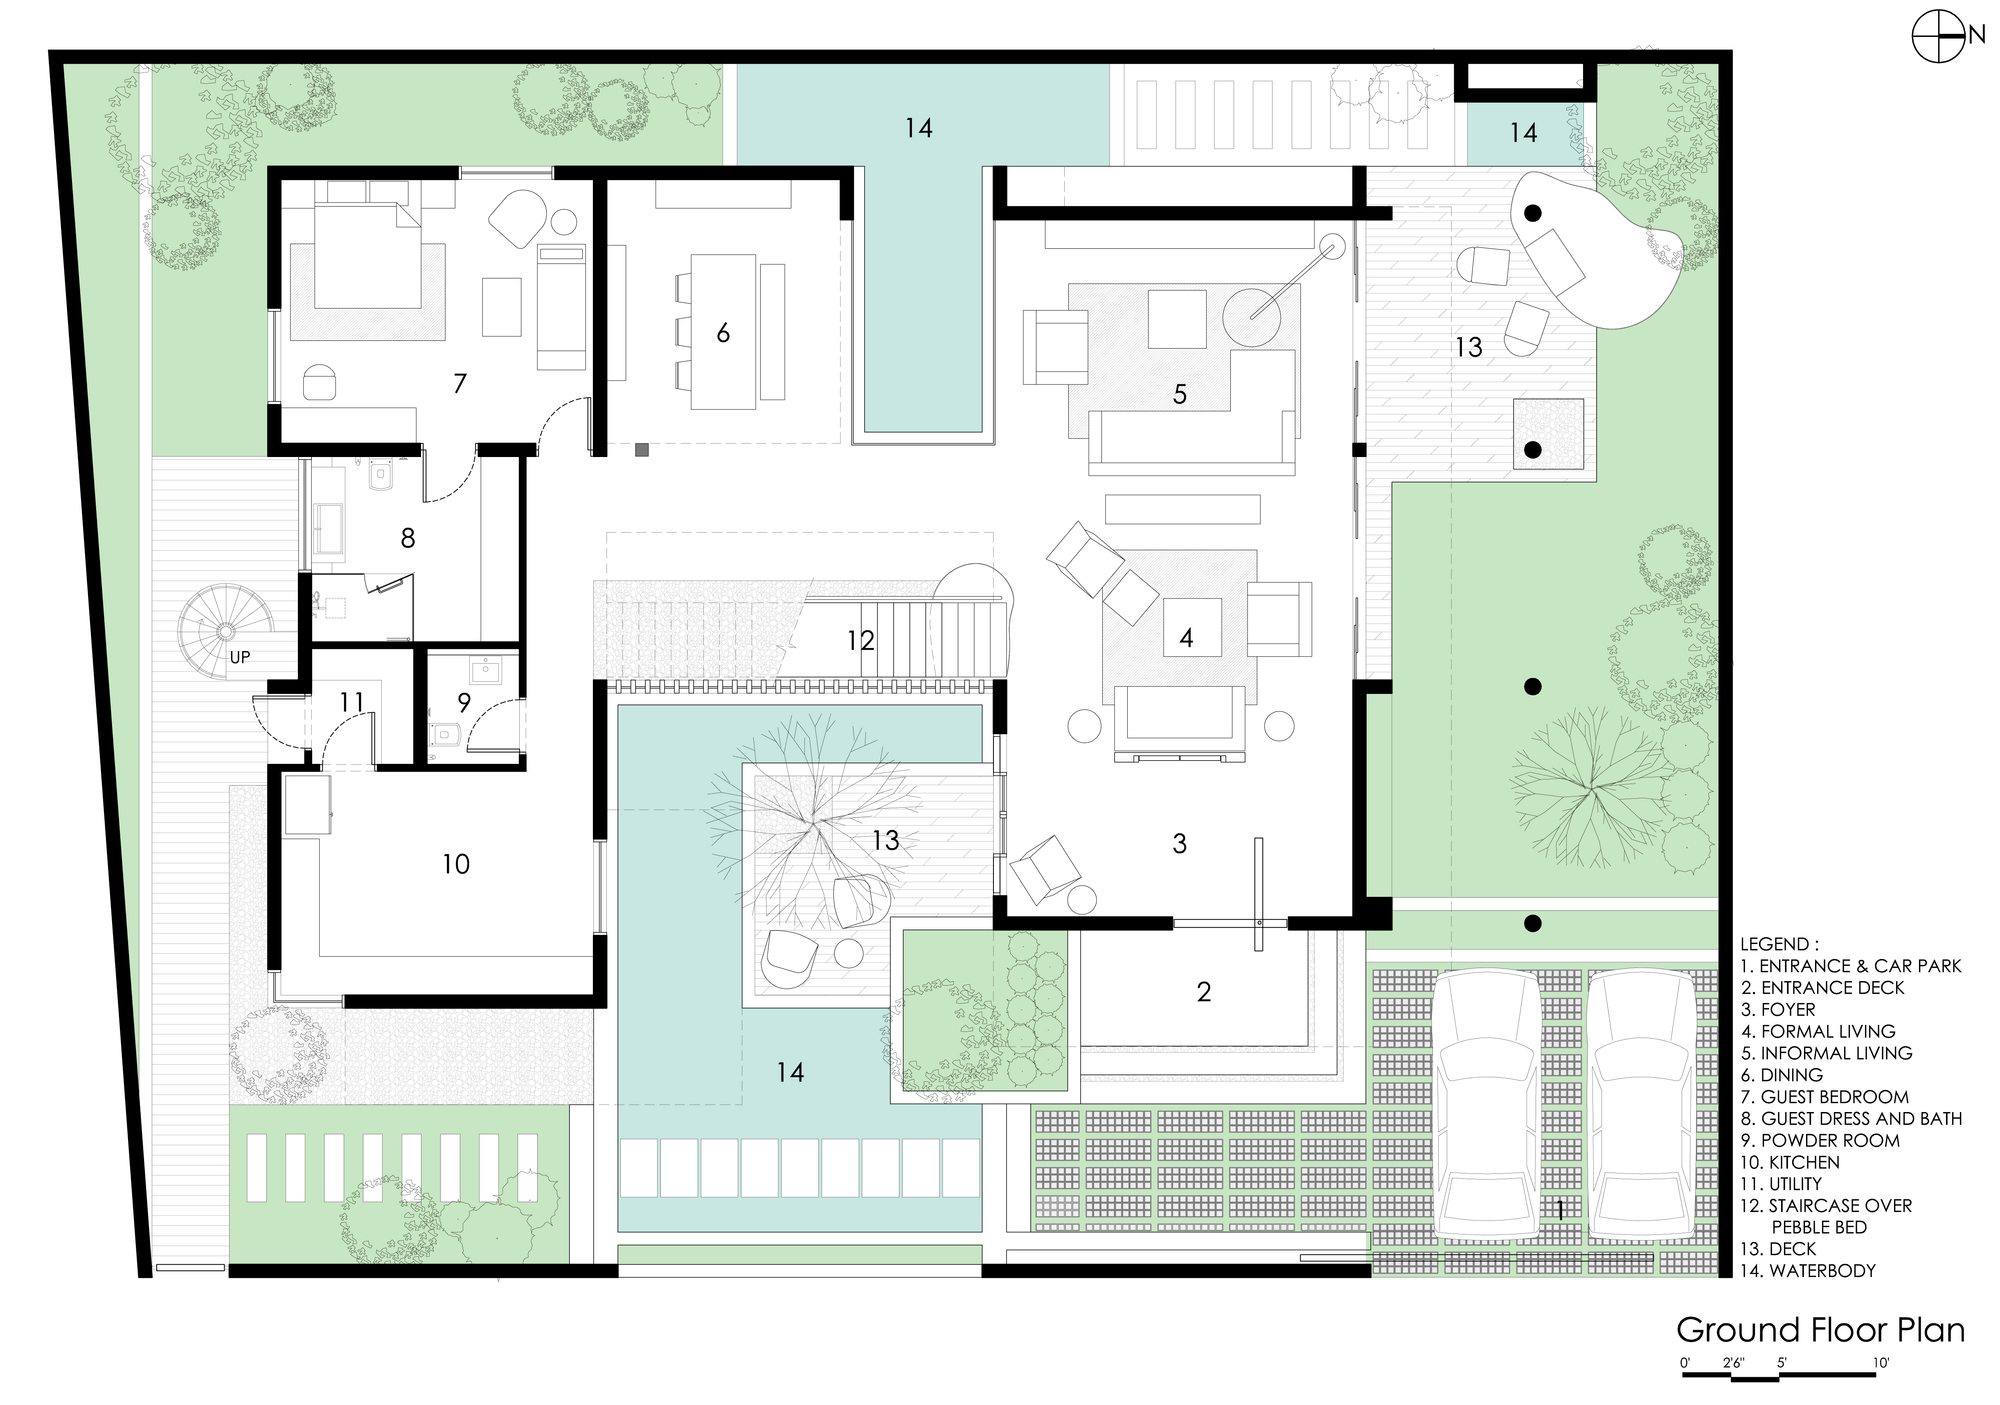 Courtyard house abin design studio ground floor plan